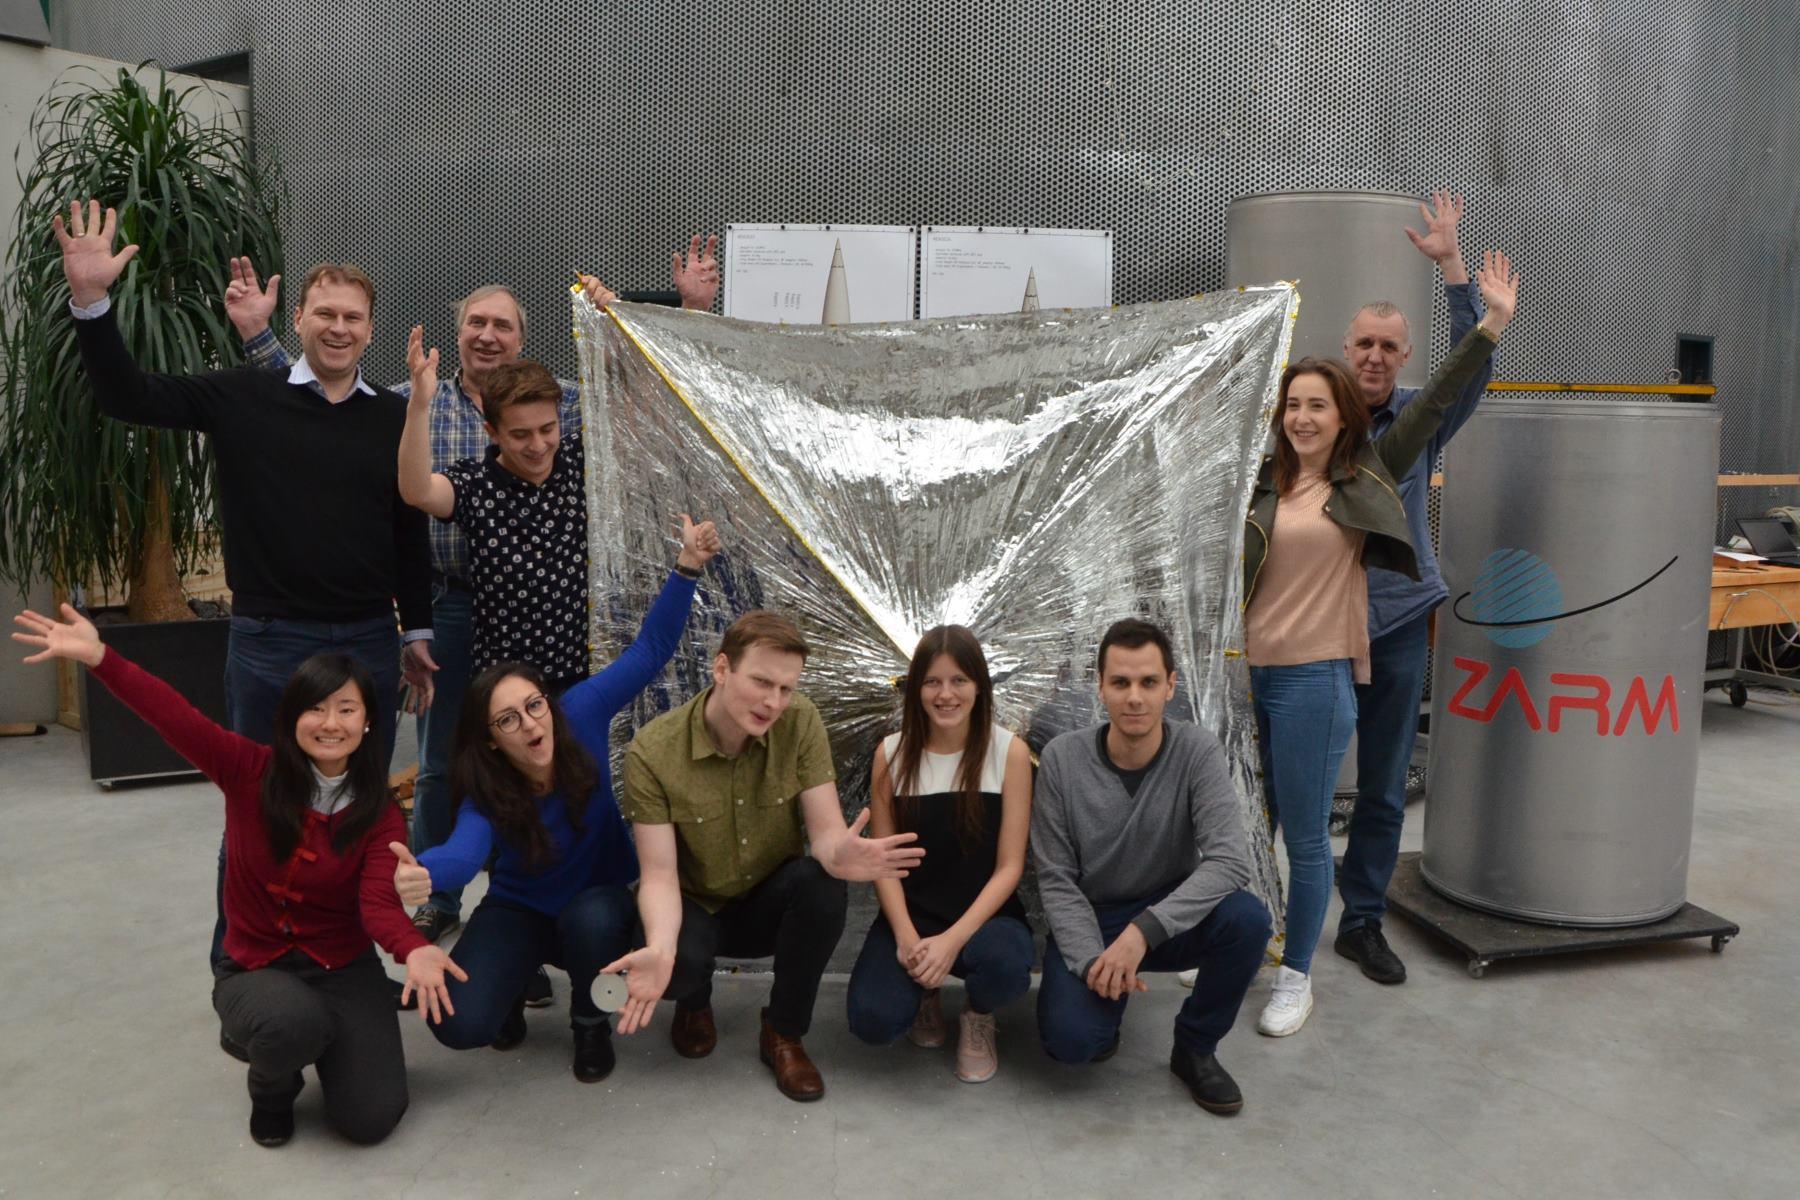 Drop Tower deorbit sail tests summary + video - PW-Sat2